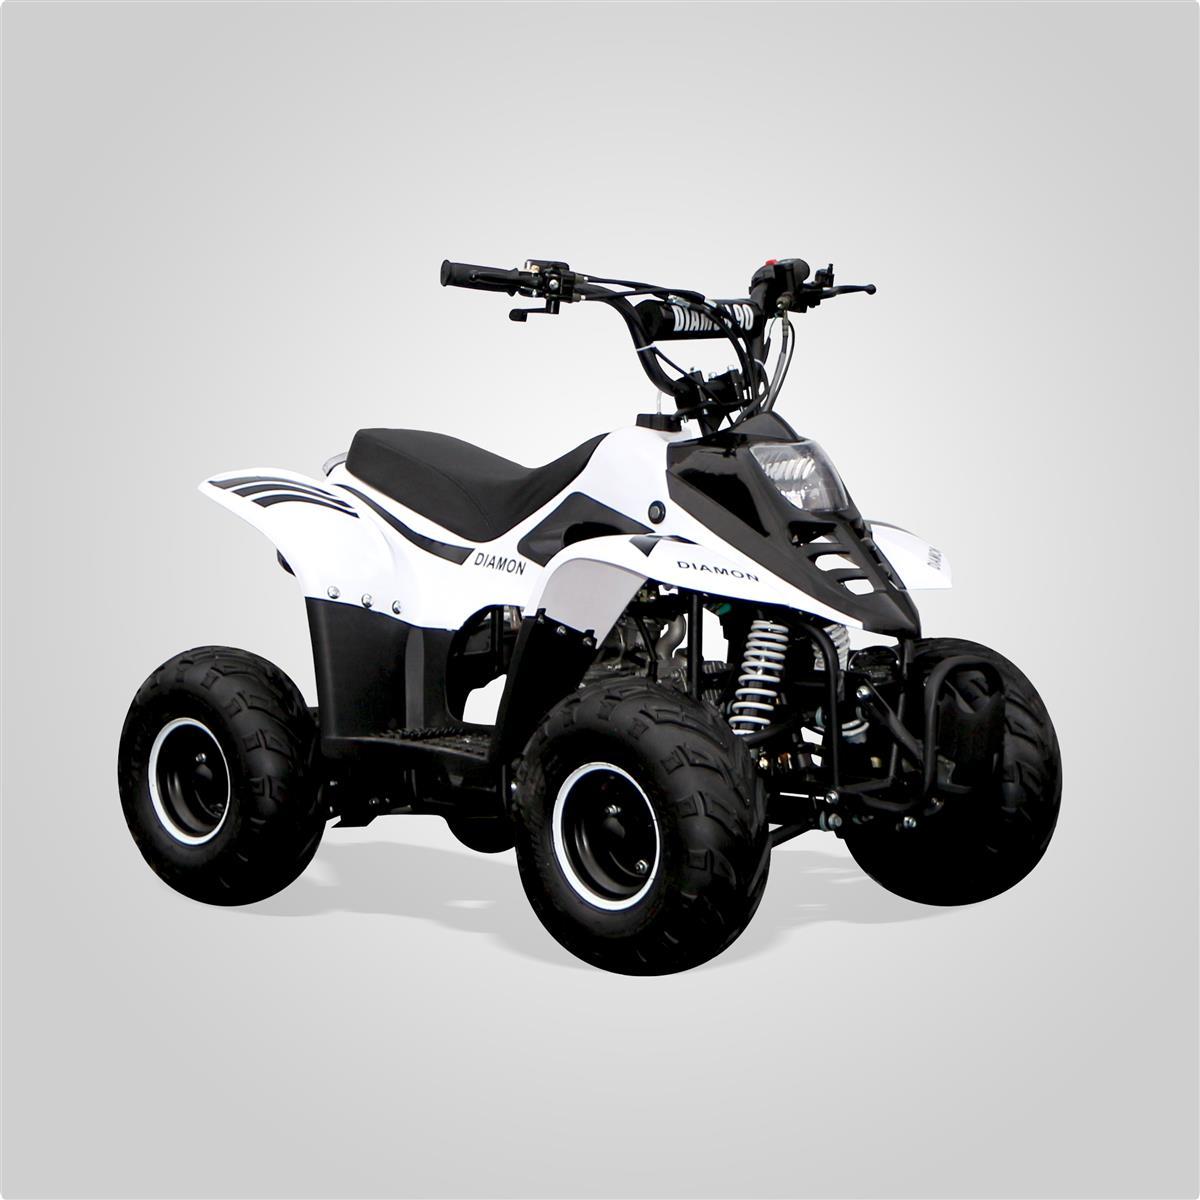 quad enfant diamon 110cc blanc smallmx dirt bike pit bike. Black Bedroom Furniture Sets. Home Design Ideas